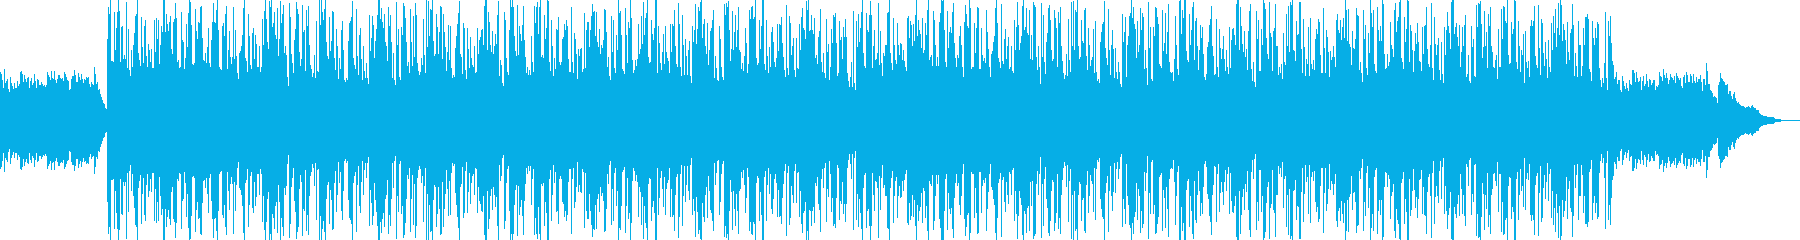 MEDIEBAL中世西洋音楽の心地よさの再生済みの波形